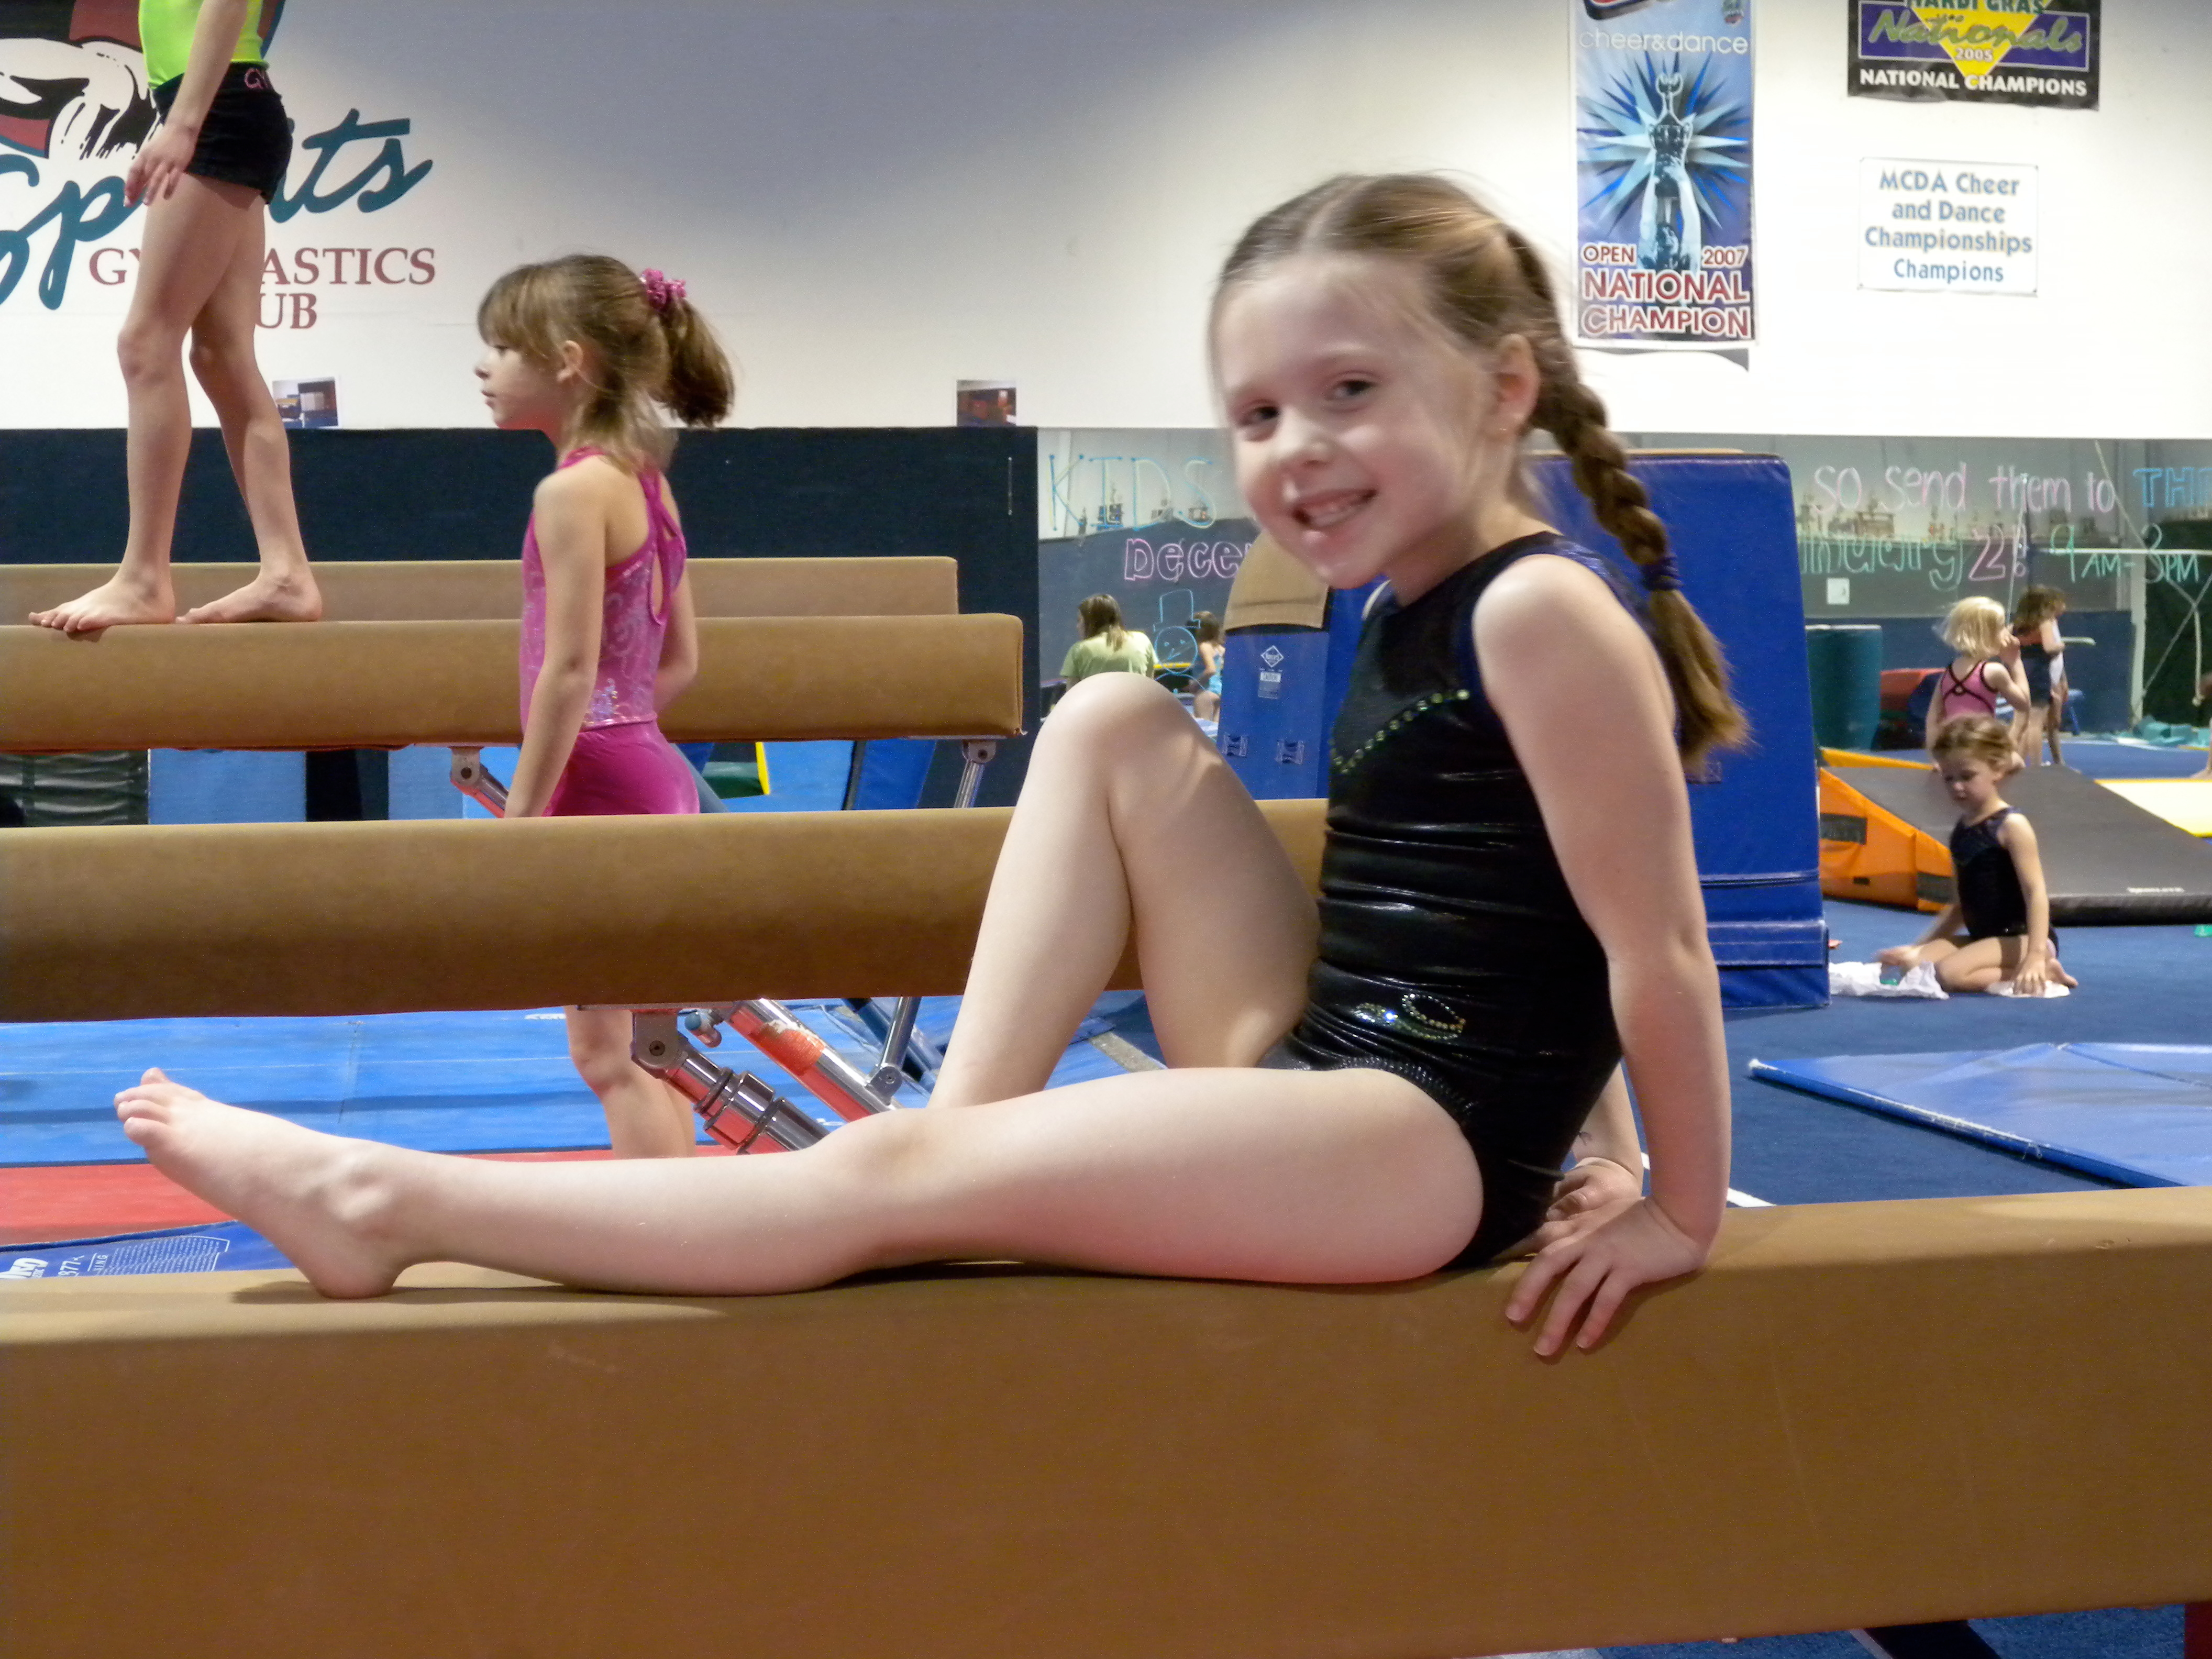 St. Louis Spirits Gymnastics Club image 1